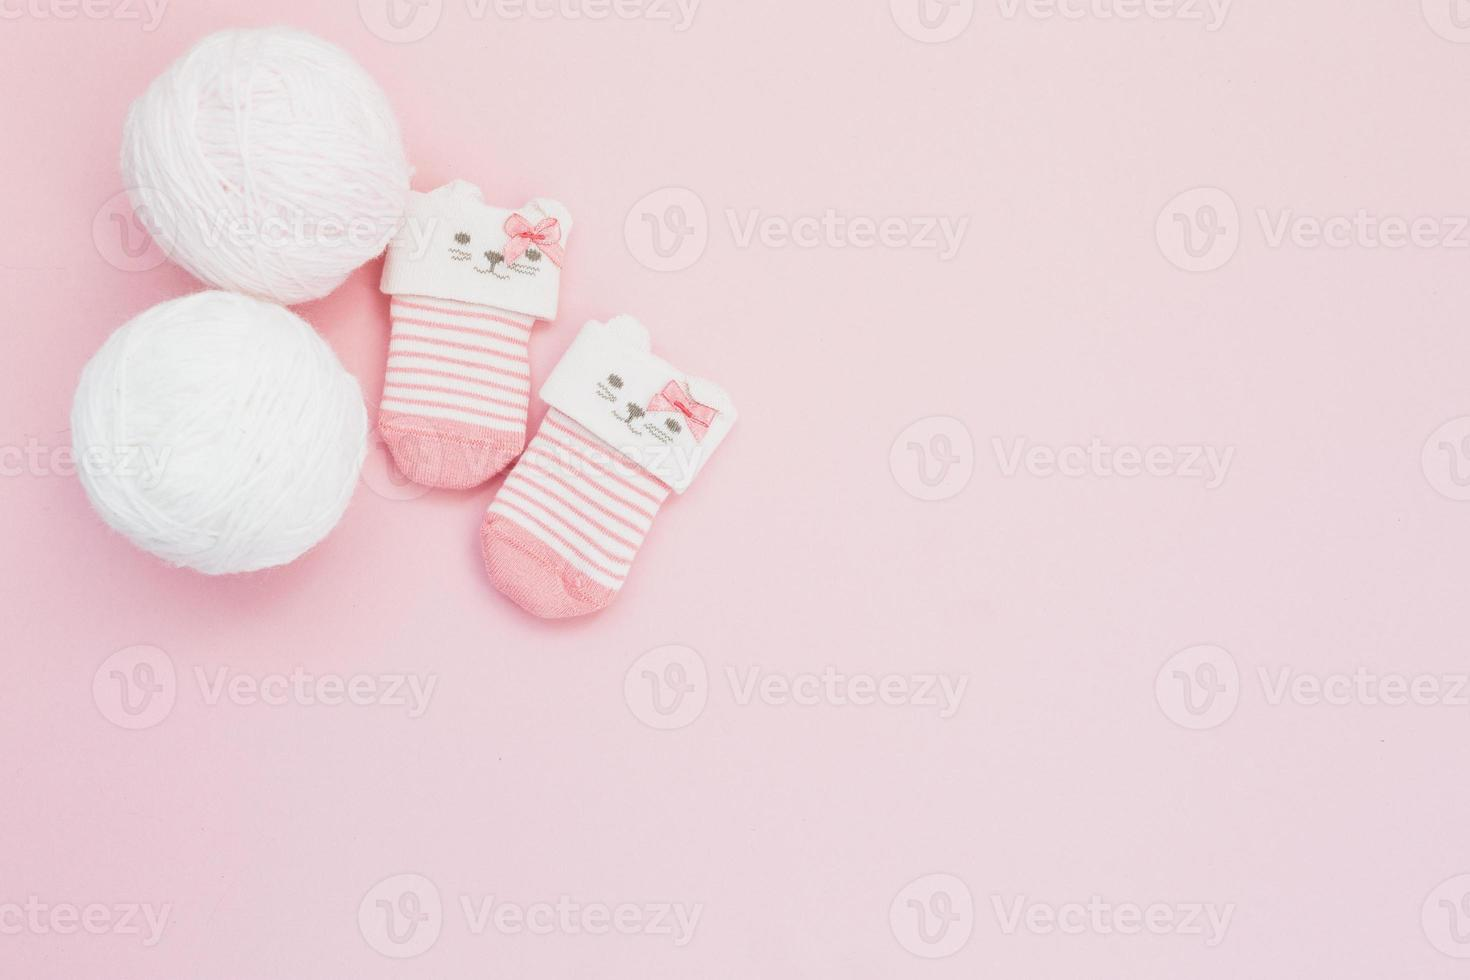 lindos calcetines de lana minúsculos sobre fondo rosa foto